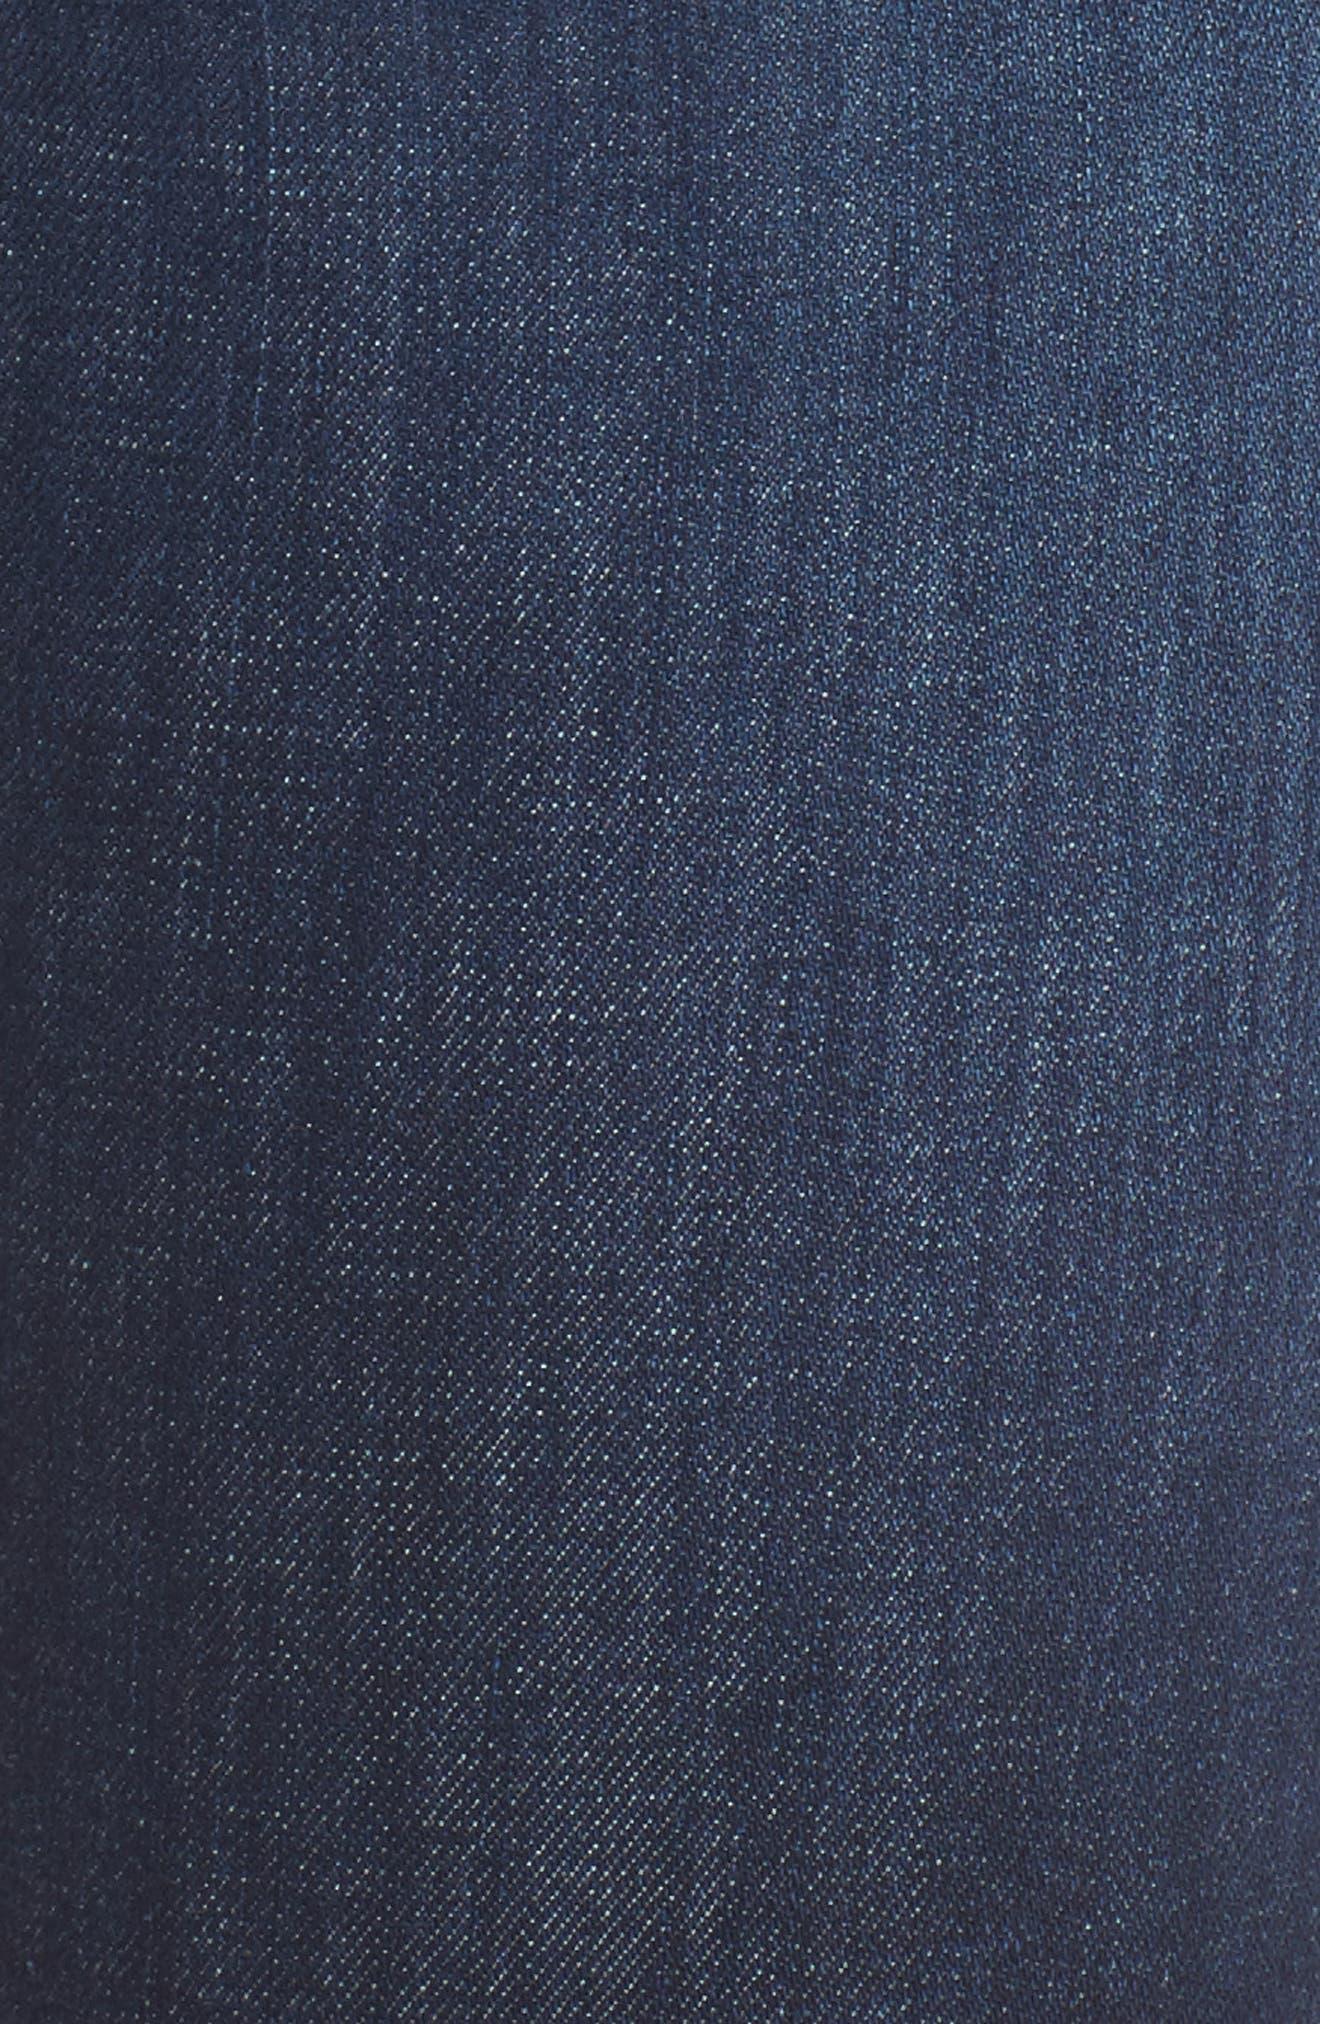 Nico Super Skinny Jeans,                             Alternate thumbnail 15, color,